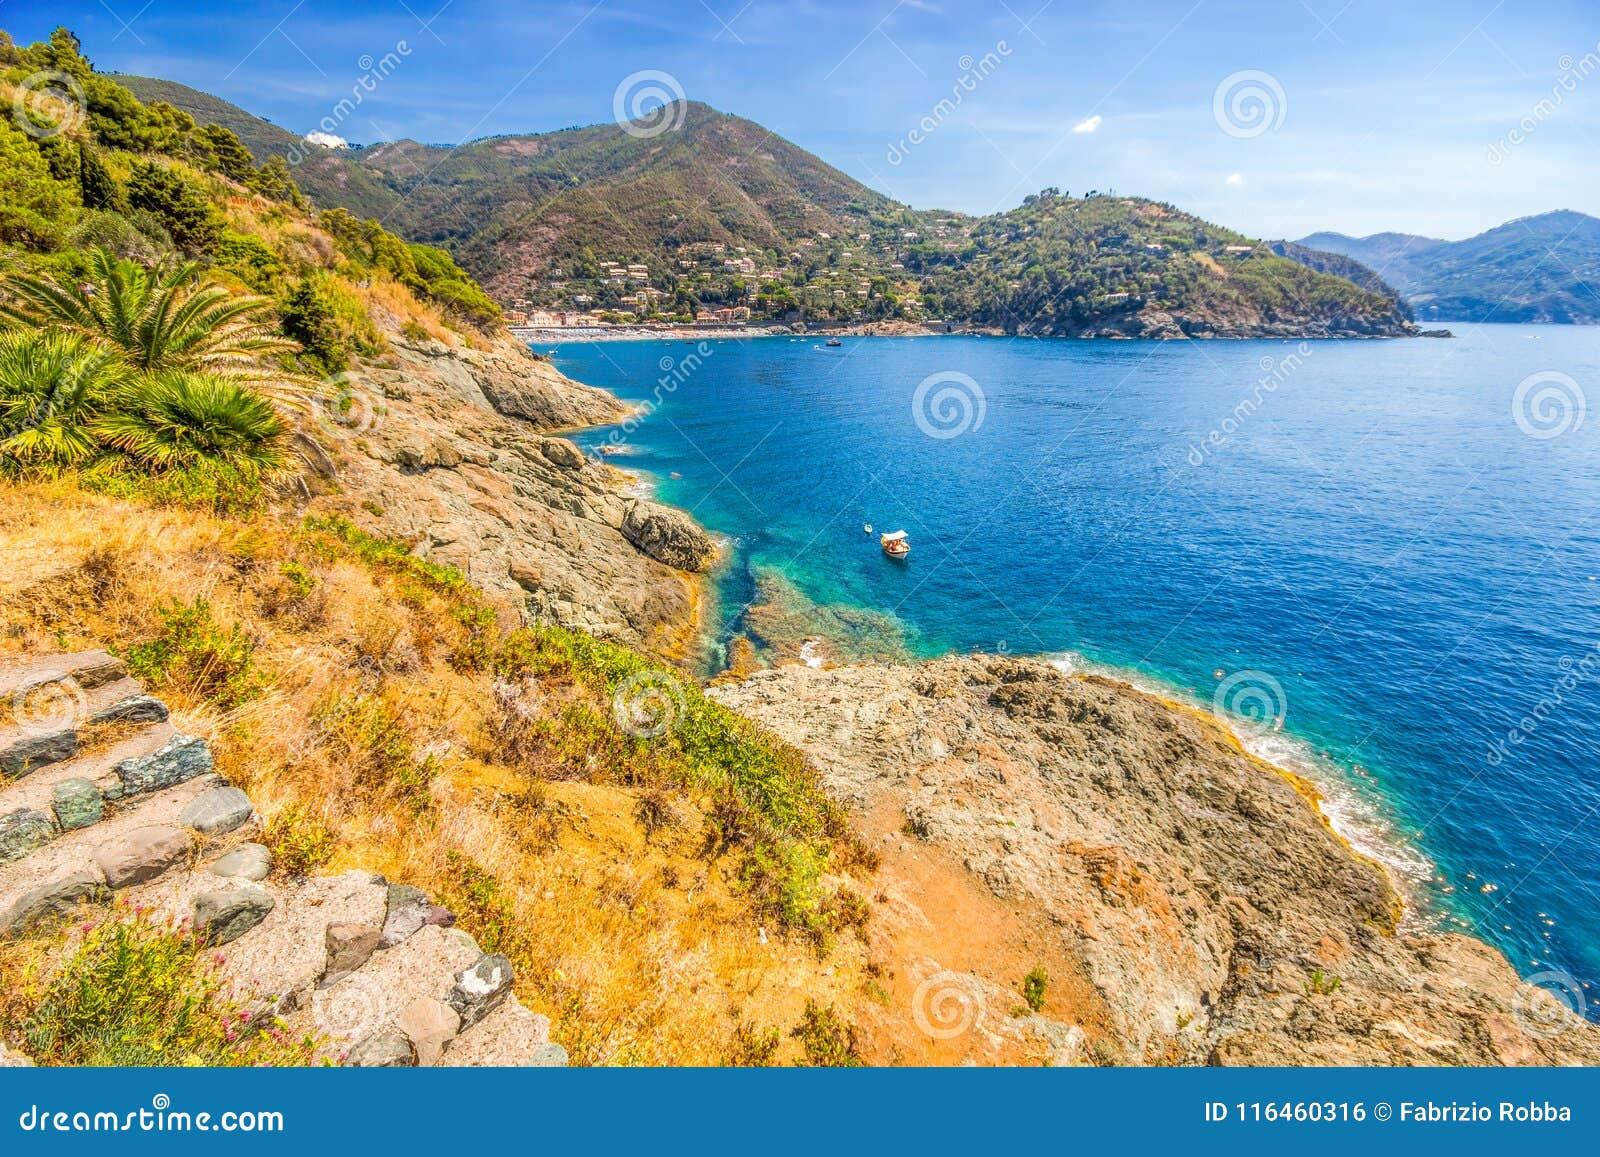 Vista panorâmica de Bonassola, vila antiga na costa leste Ligurian, perto de 5 Terre, província de Spezia do La, Itália